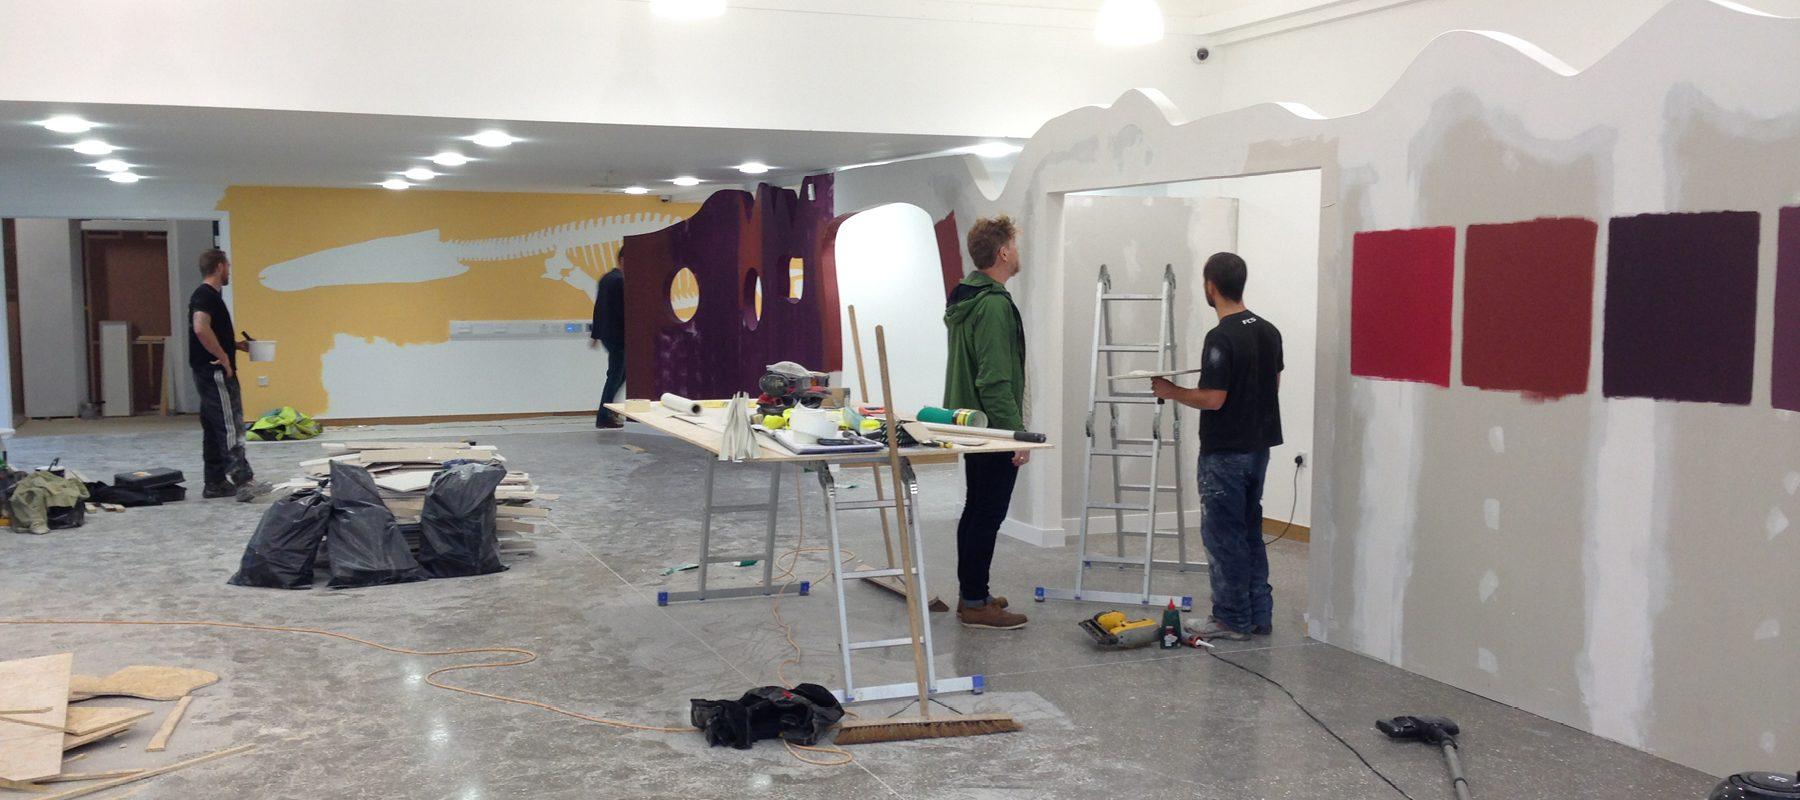 seaton jurassic devon behind the scenes paint choices interior design